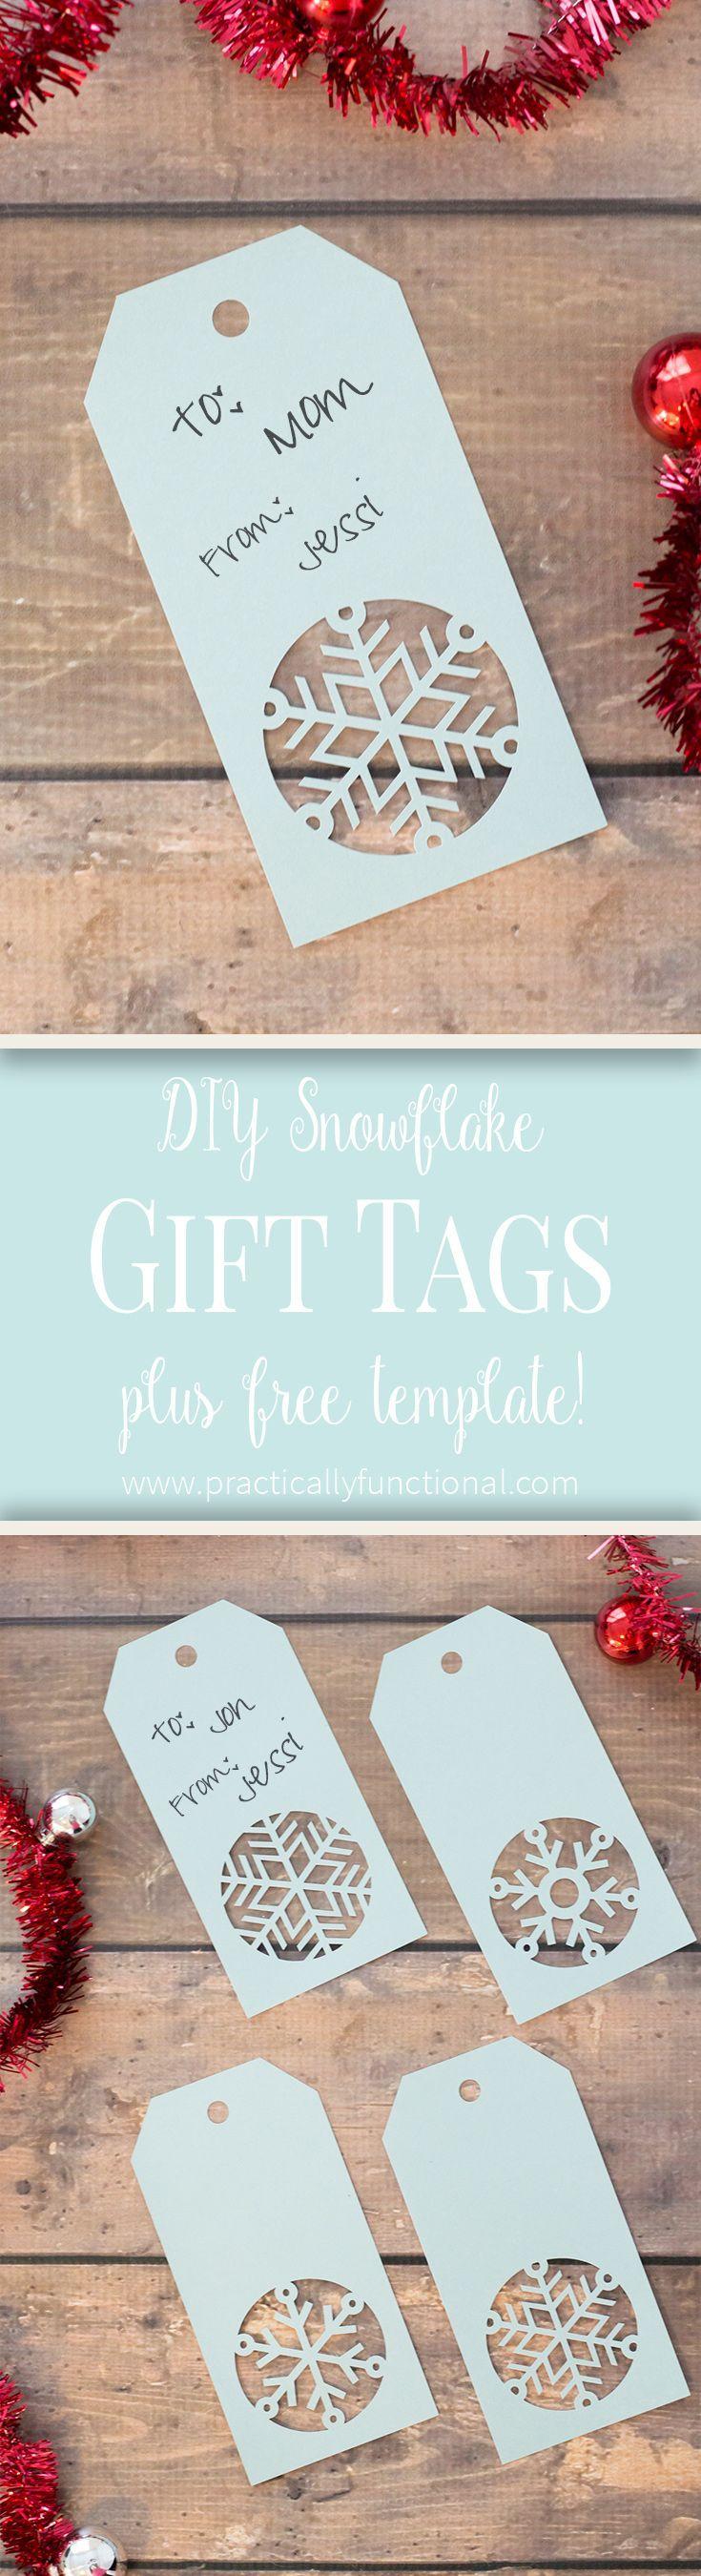 Paper Cut Holiday Gift Tags | Holiday gift tags, Diy holiday gifts ...